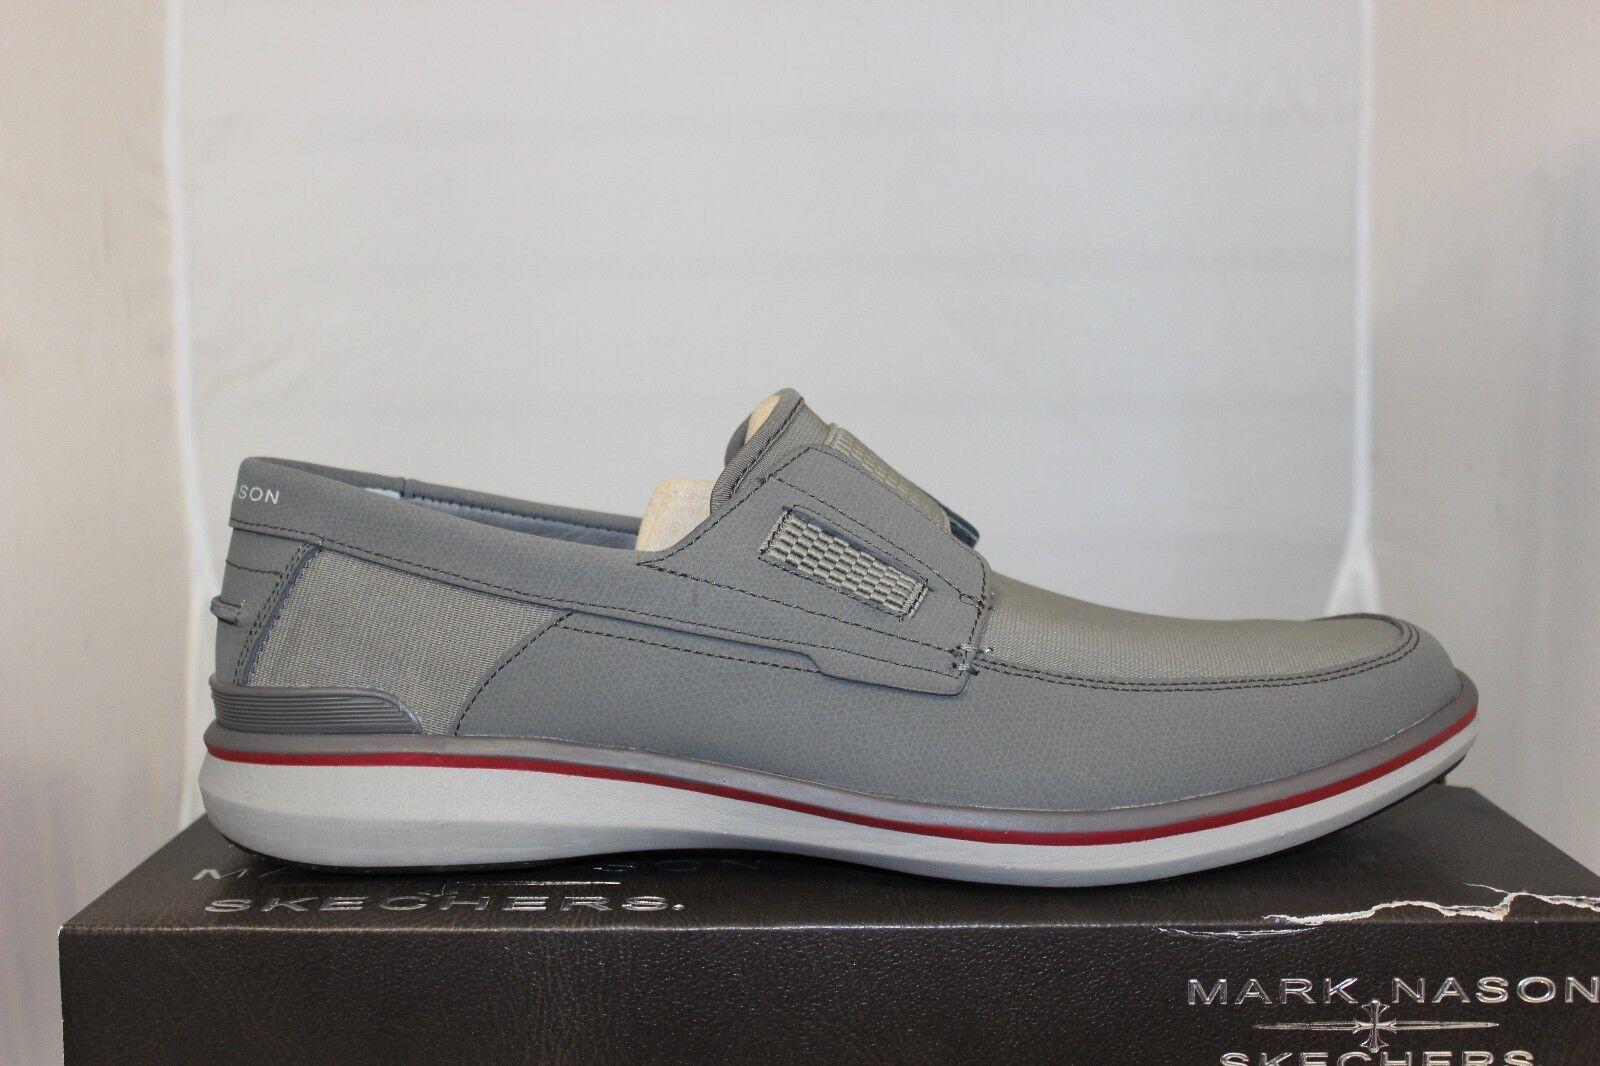 Men's Skechers Mark Nason Filey 68127 CHAR Charcoal Memory Foam Slip On Sz 7-14